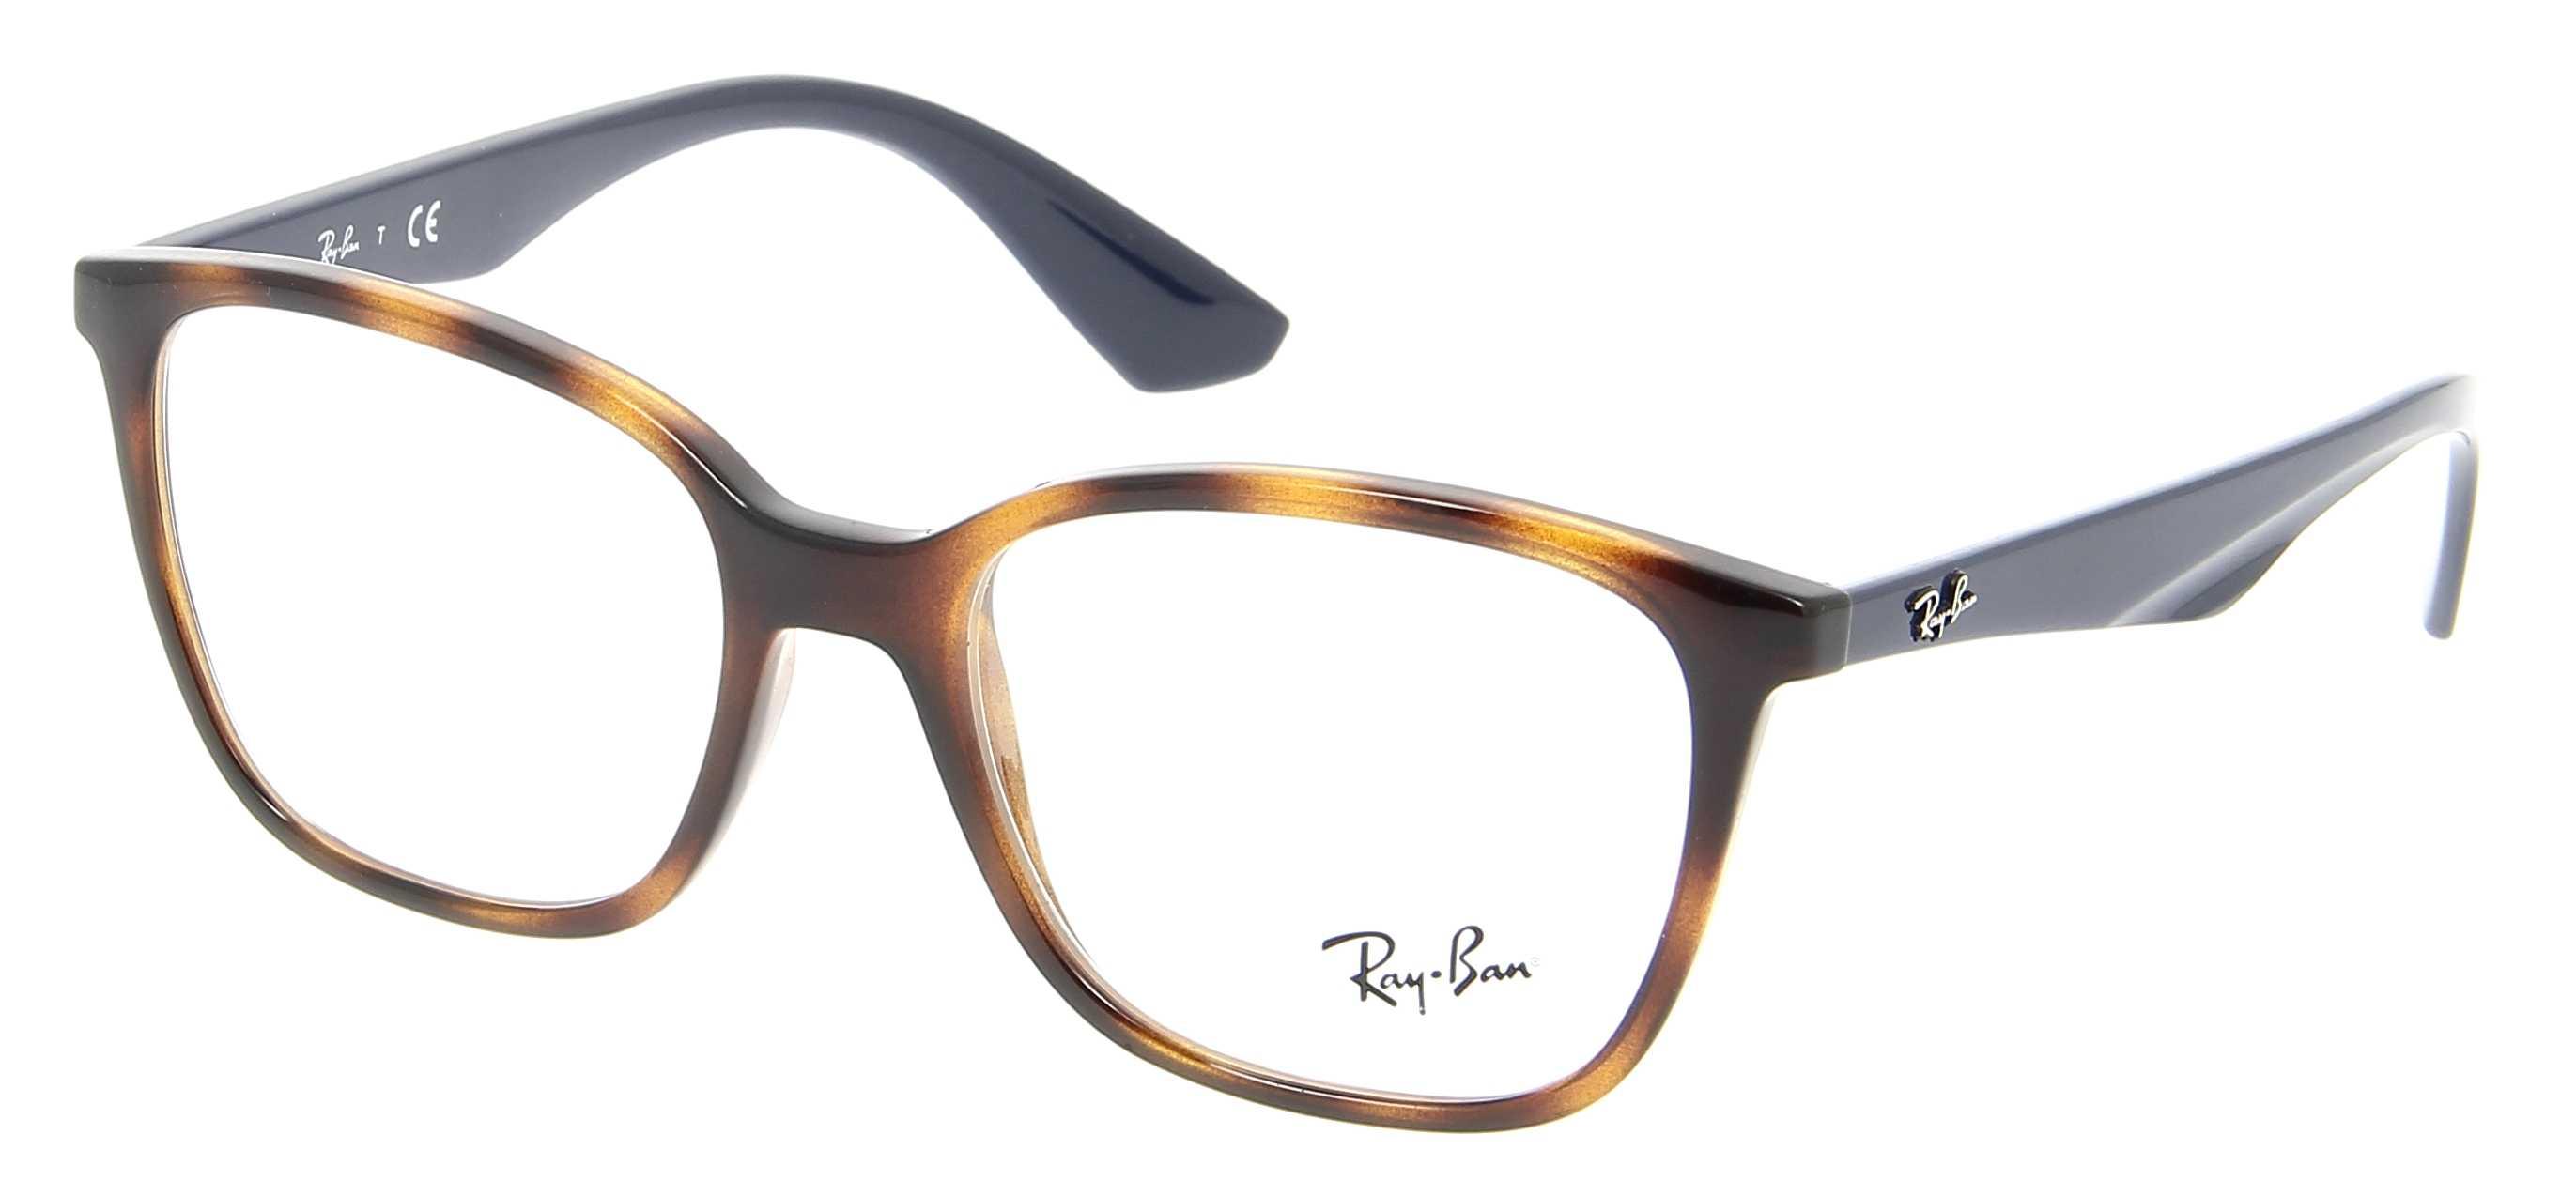 ba1da4d90c Get Free Shipping on Ray-Ban RX Eyeglasses RX7066